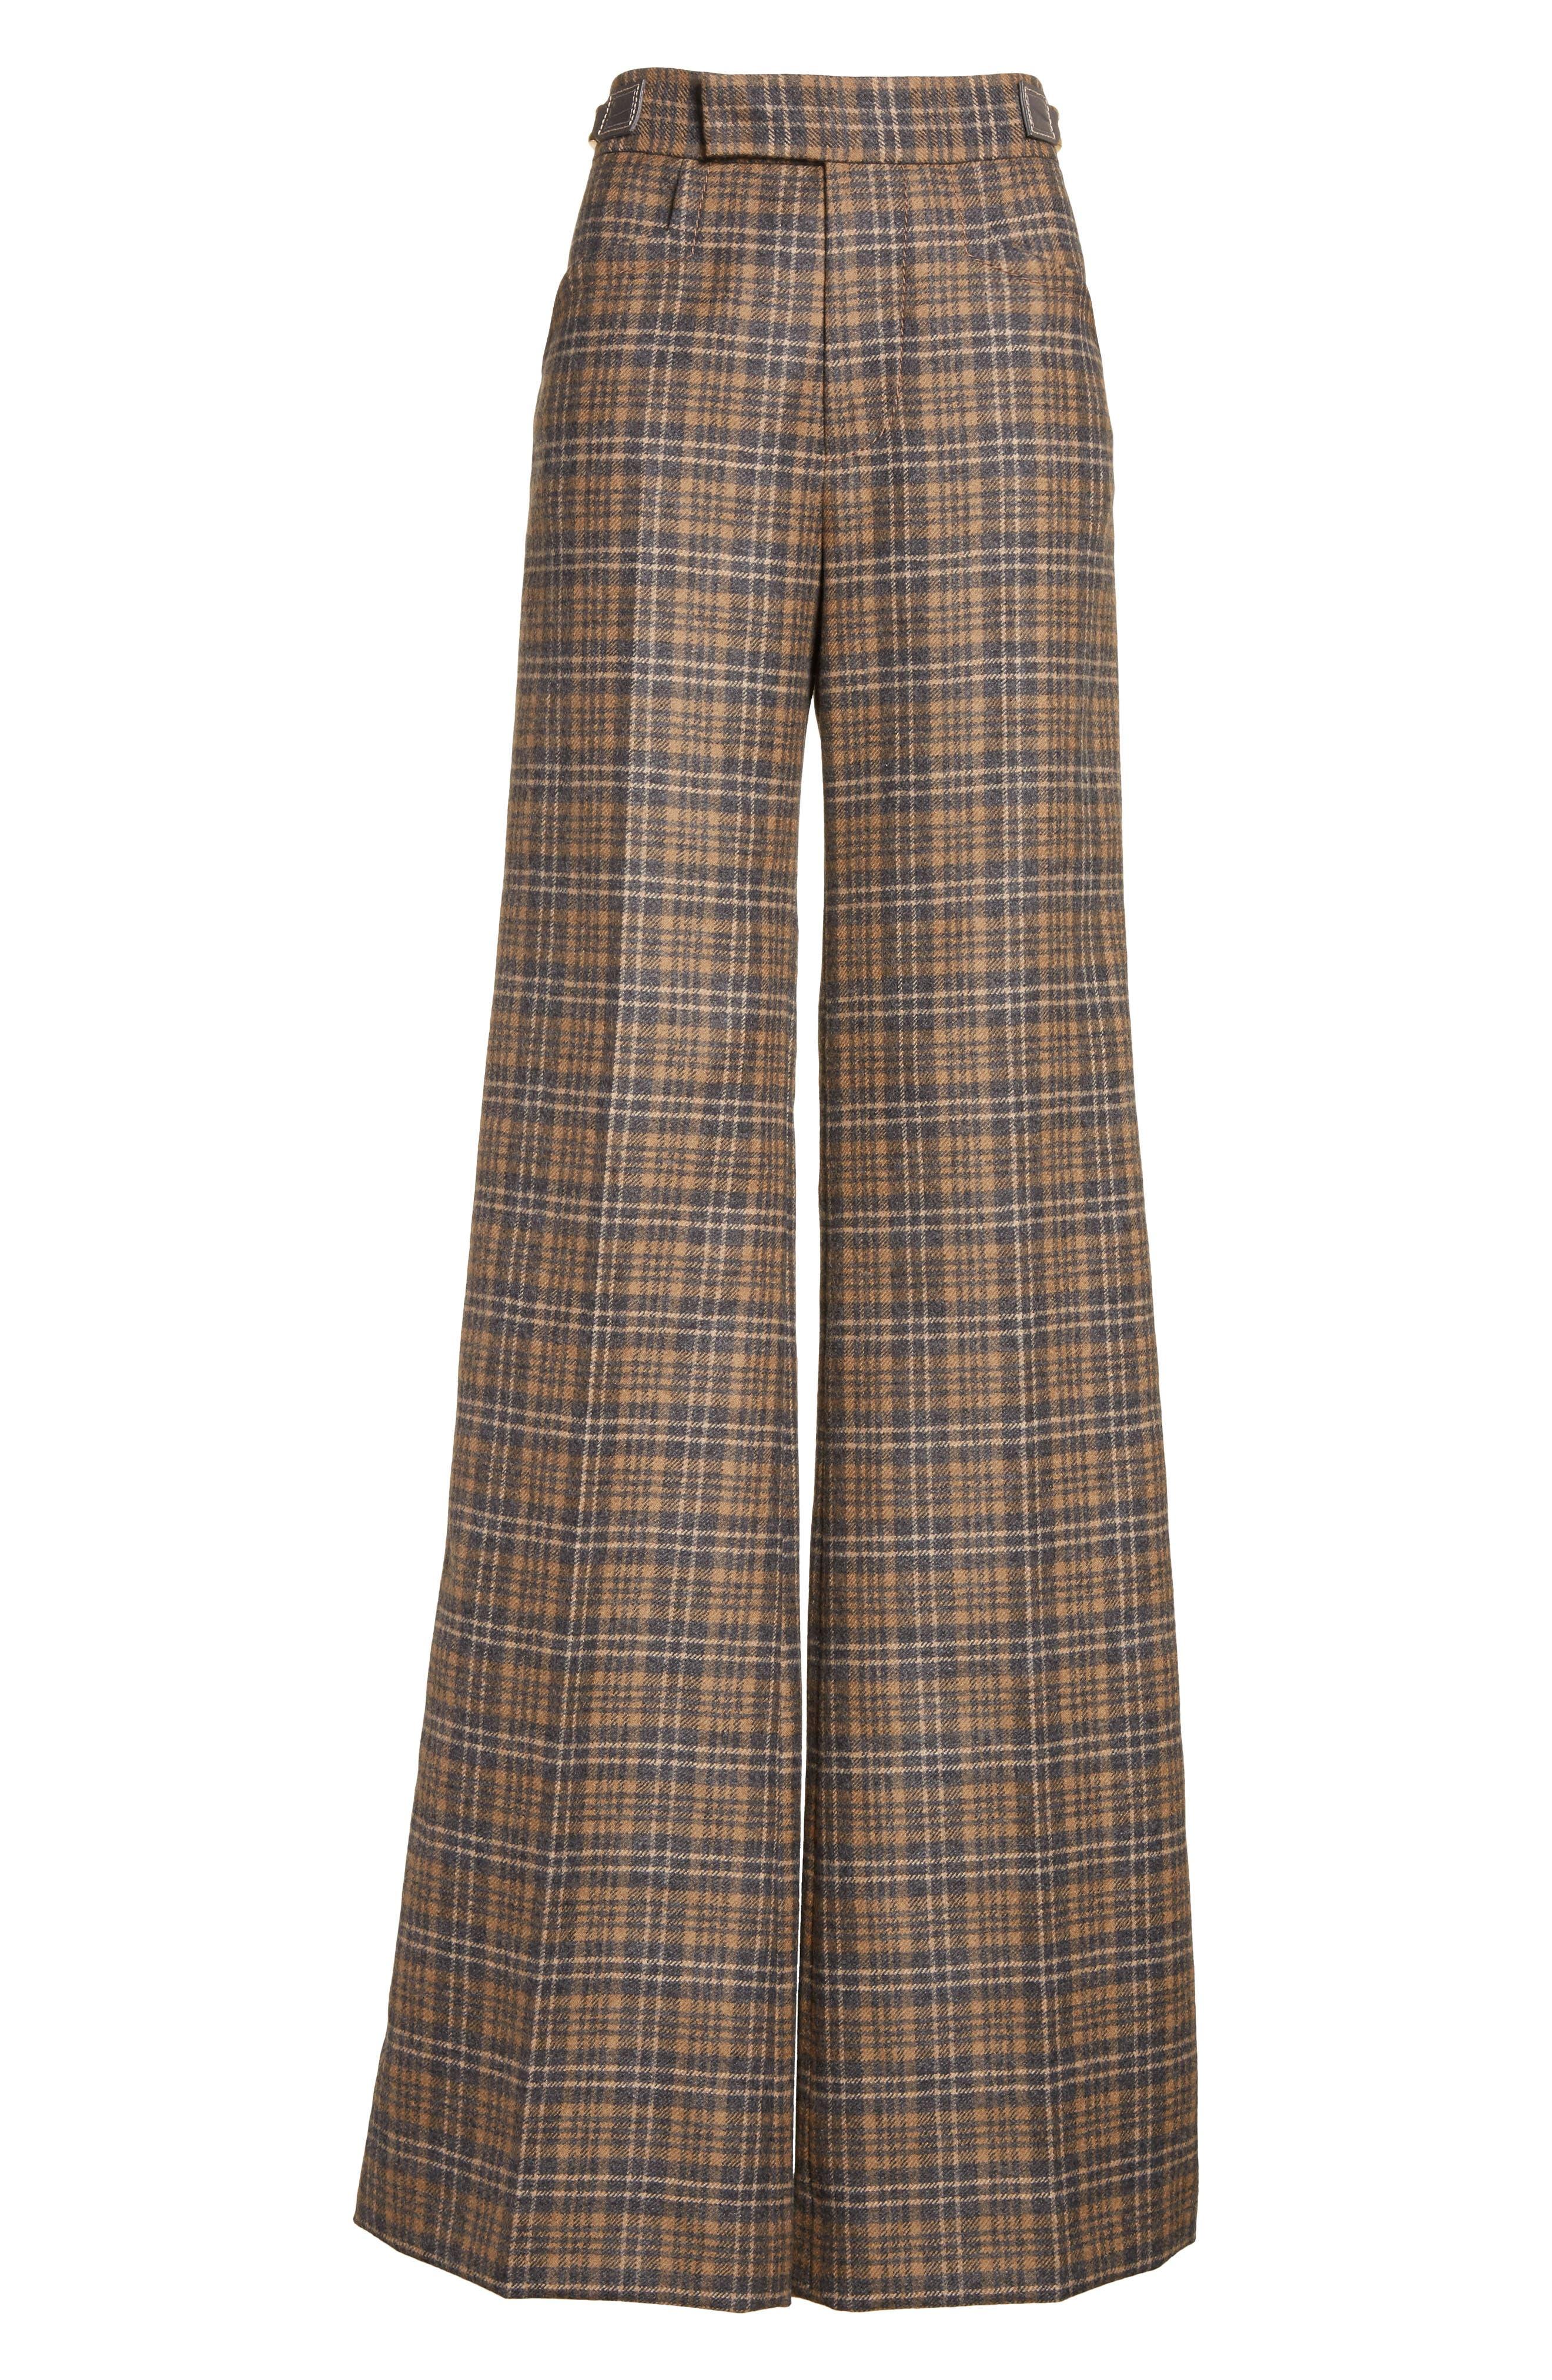 Plaid Wool Blend Wide Leg Pants,                             Alternate thumbnail 6, color,                             Camel Multi